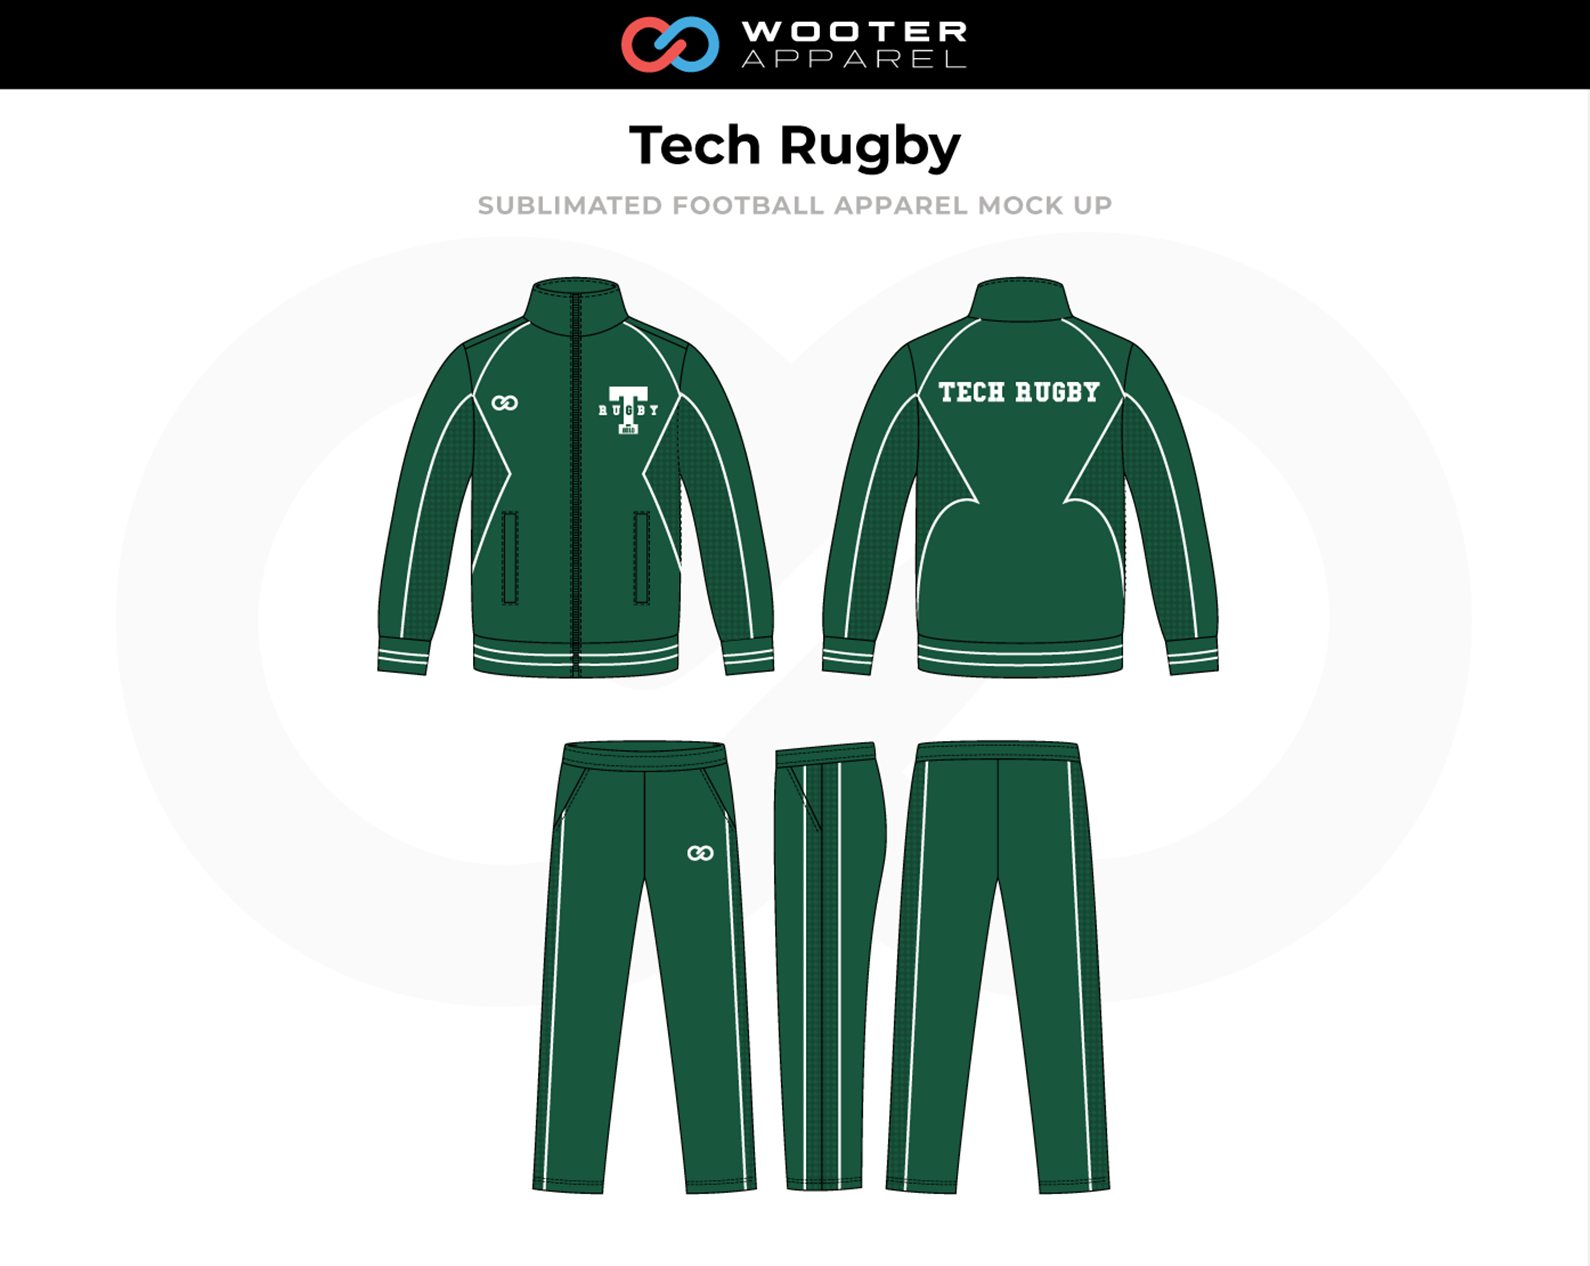 Tech-Rugby-Sublimated-Track-Suit-Mock-Up_v1_2018.png